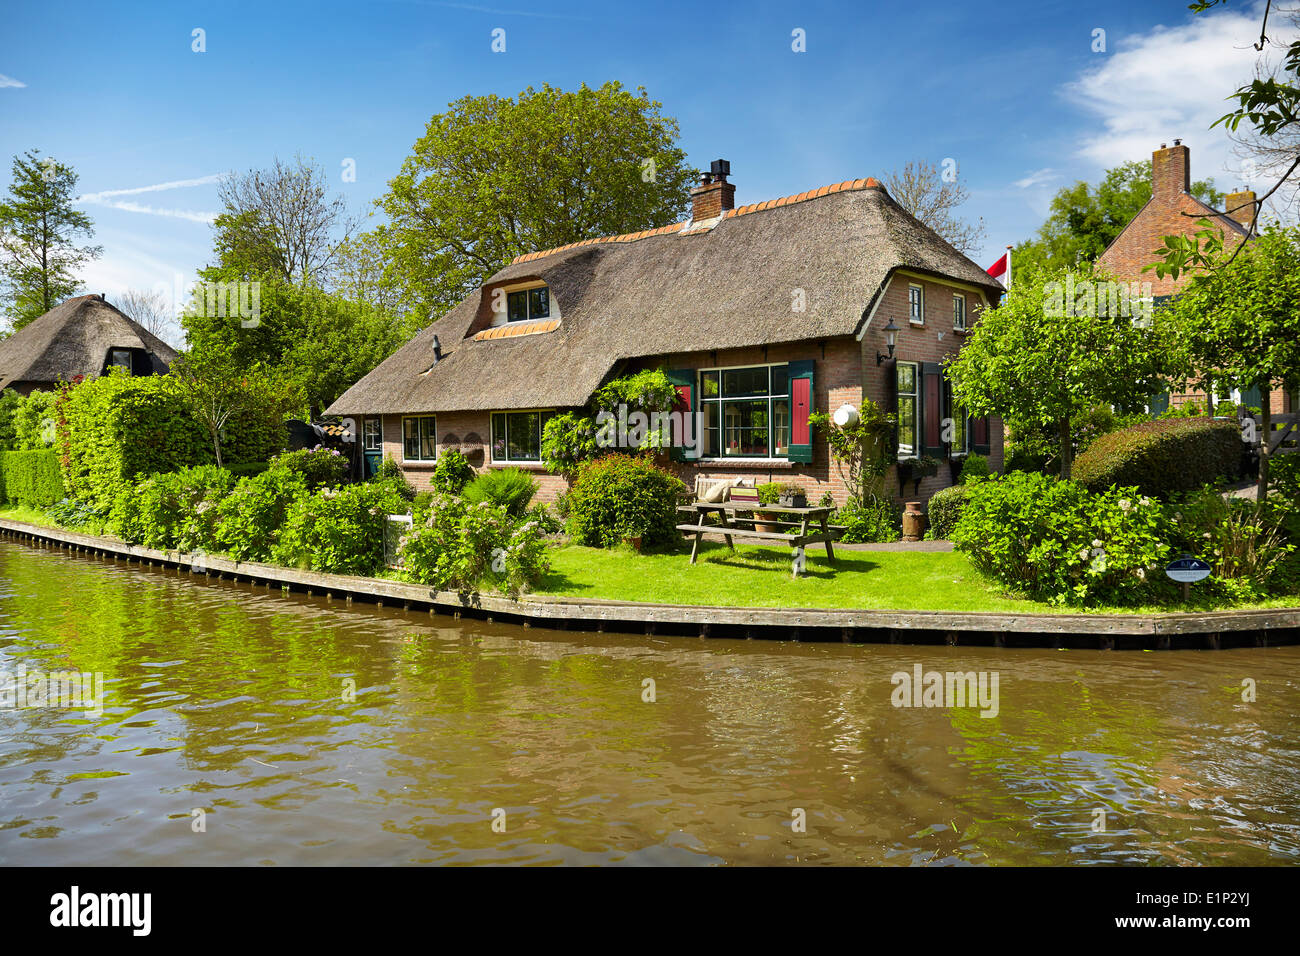 Giethoorn village - Holland Netherlands Stock Photo